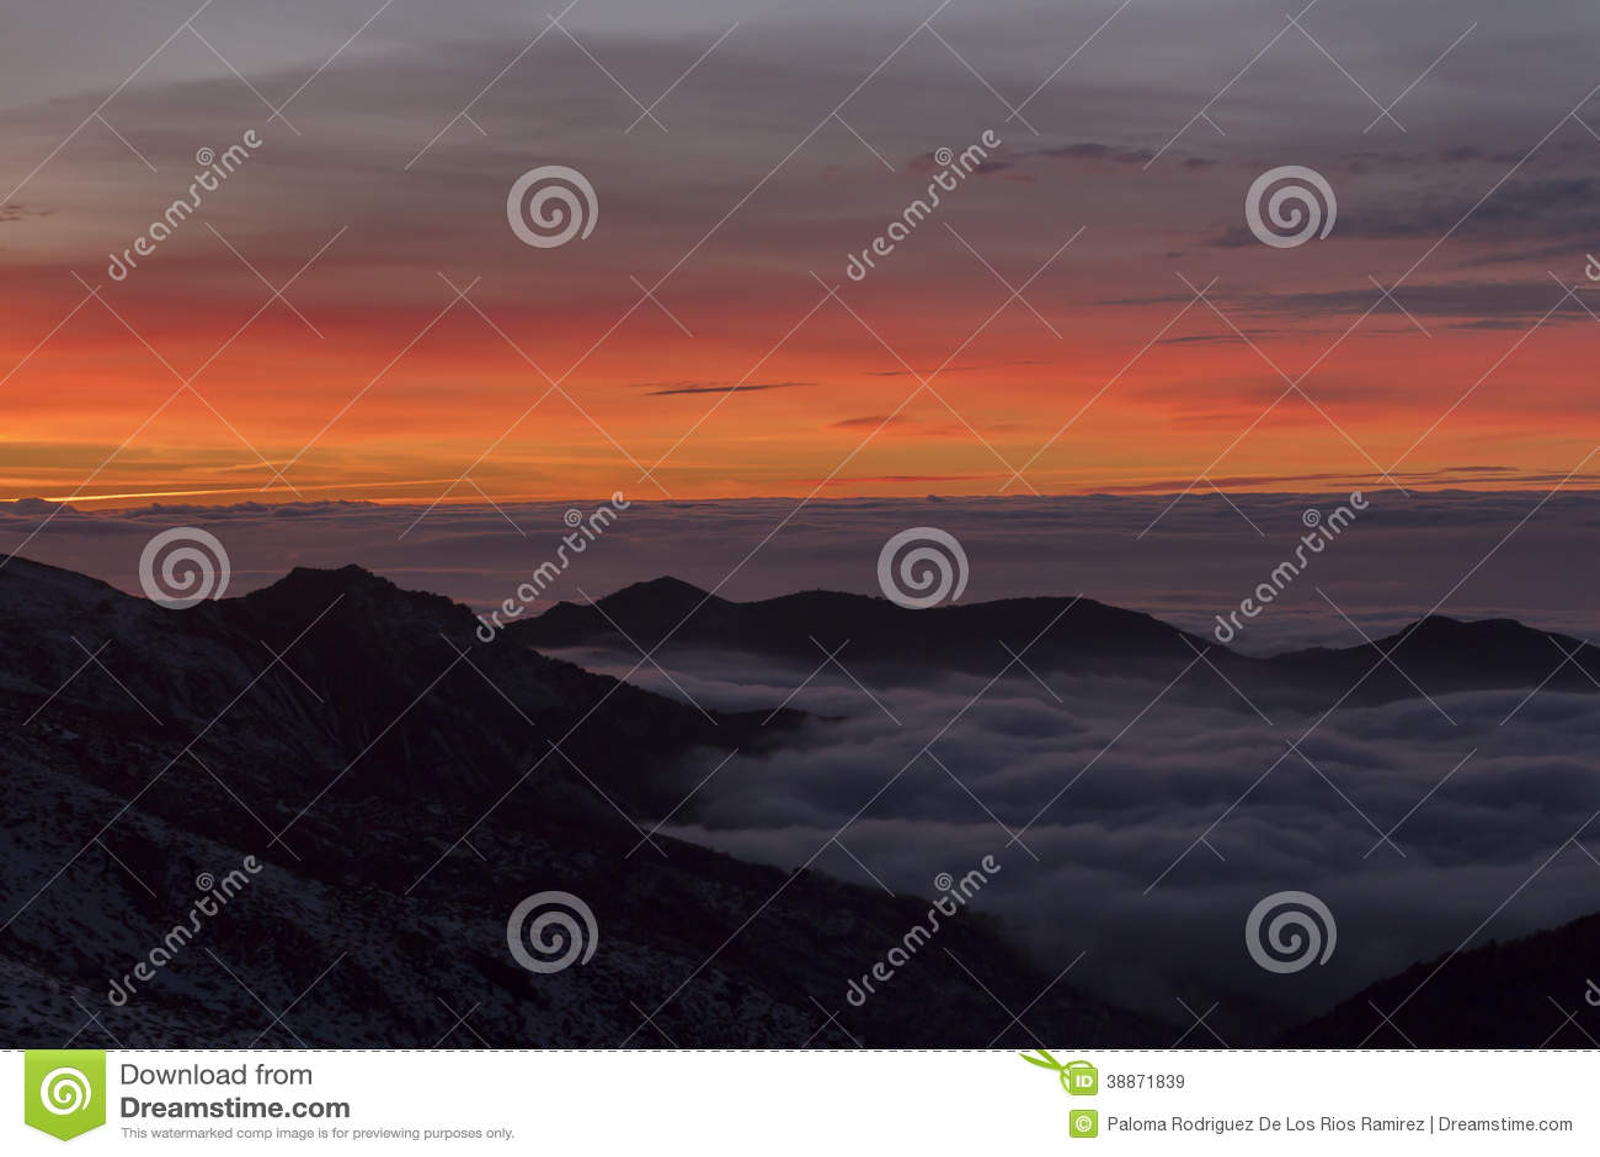 Sunset In Sierra Nevada Granada Spain Stock Image Image